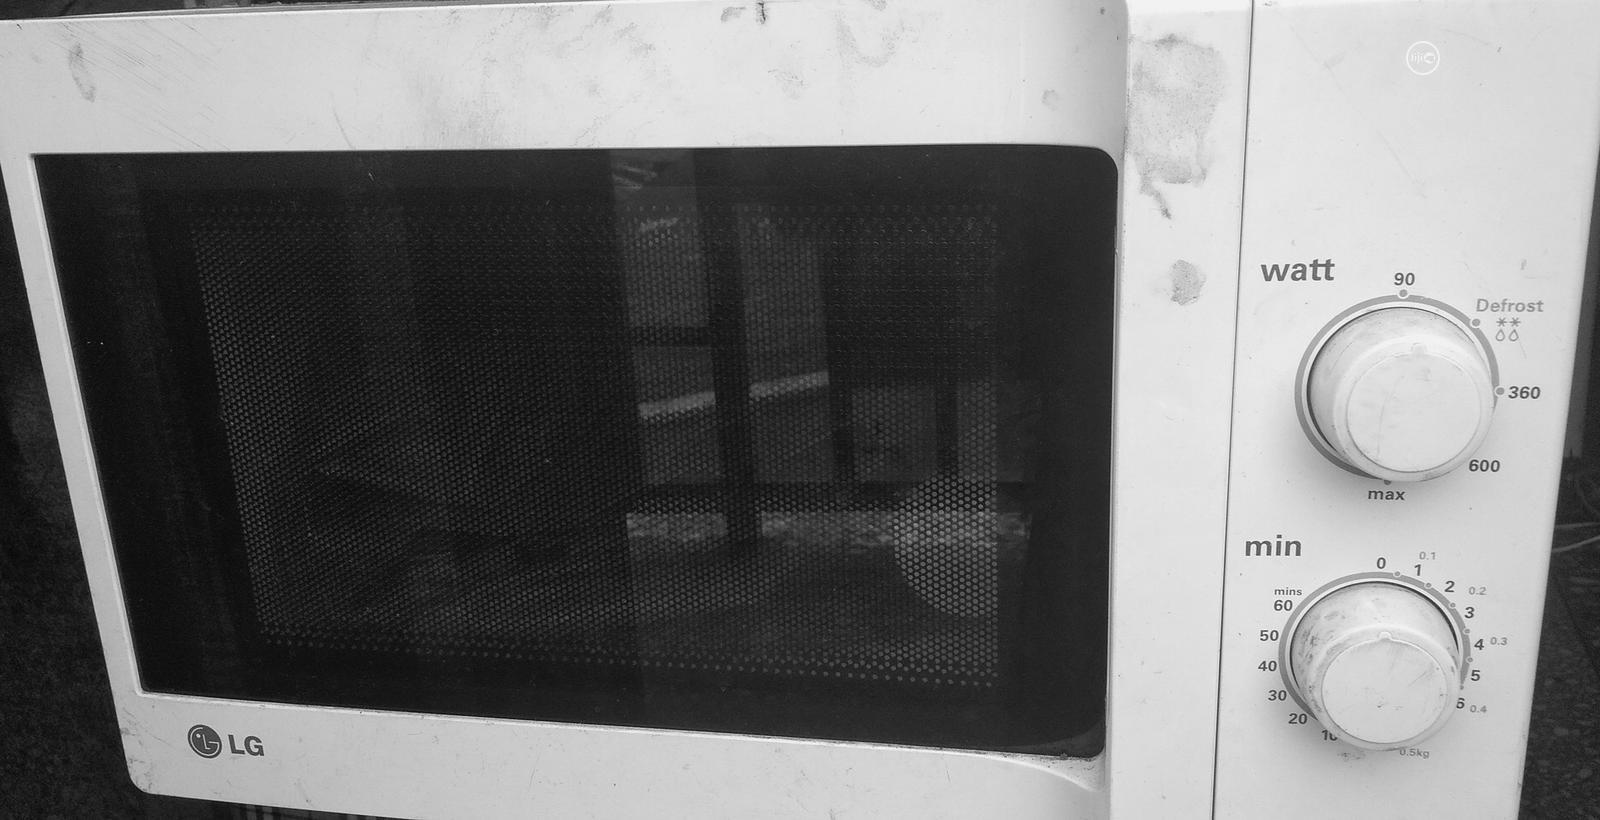 lg microwave white